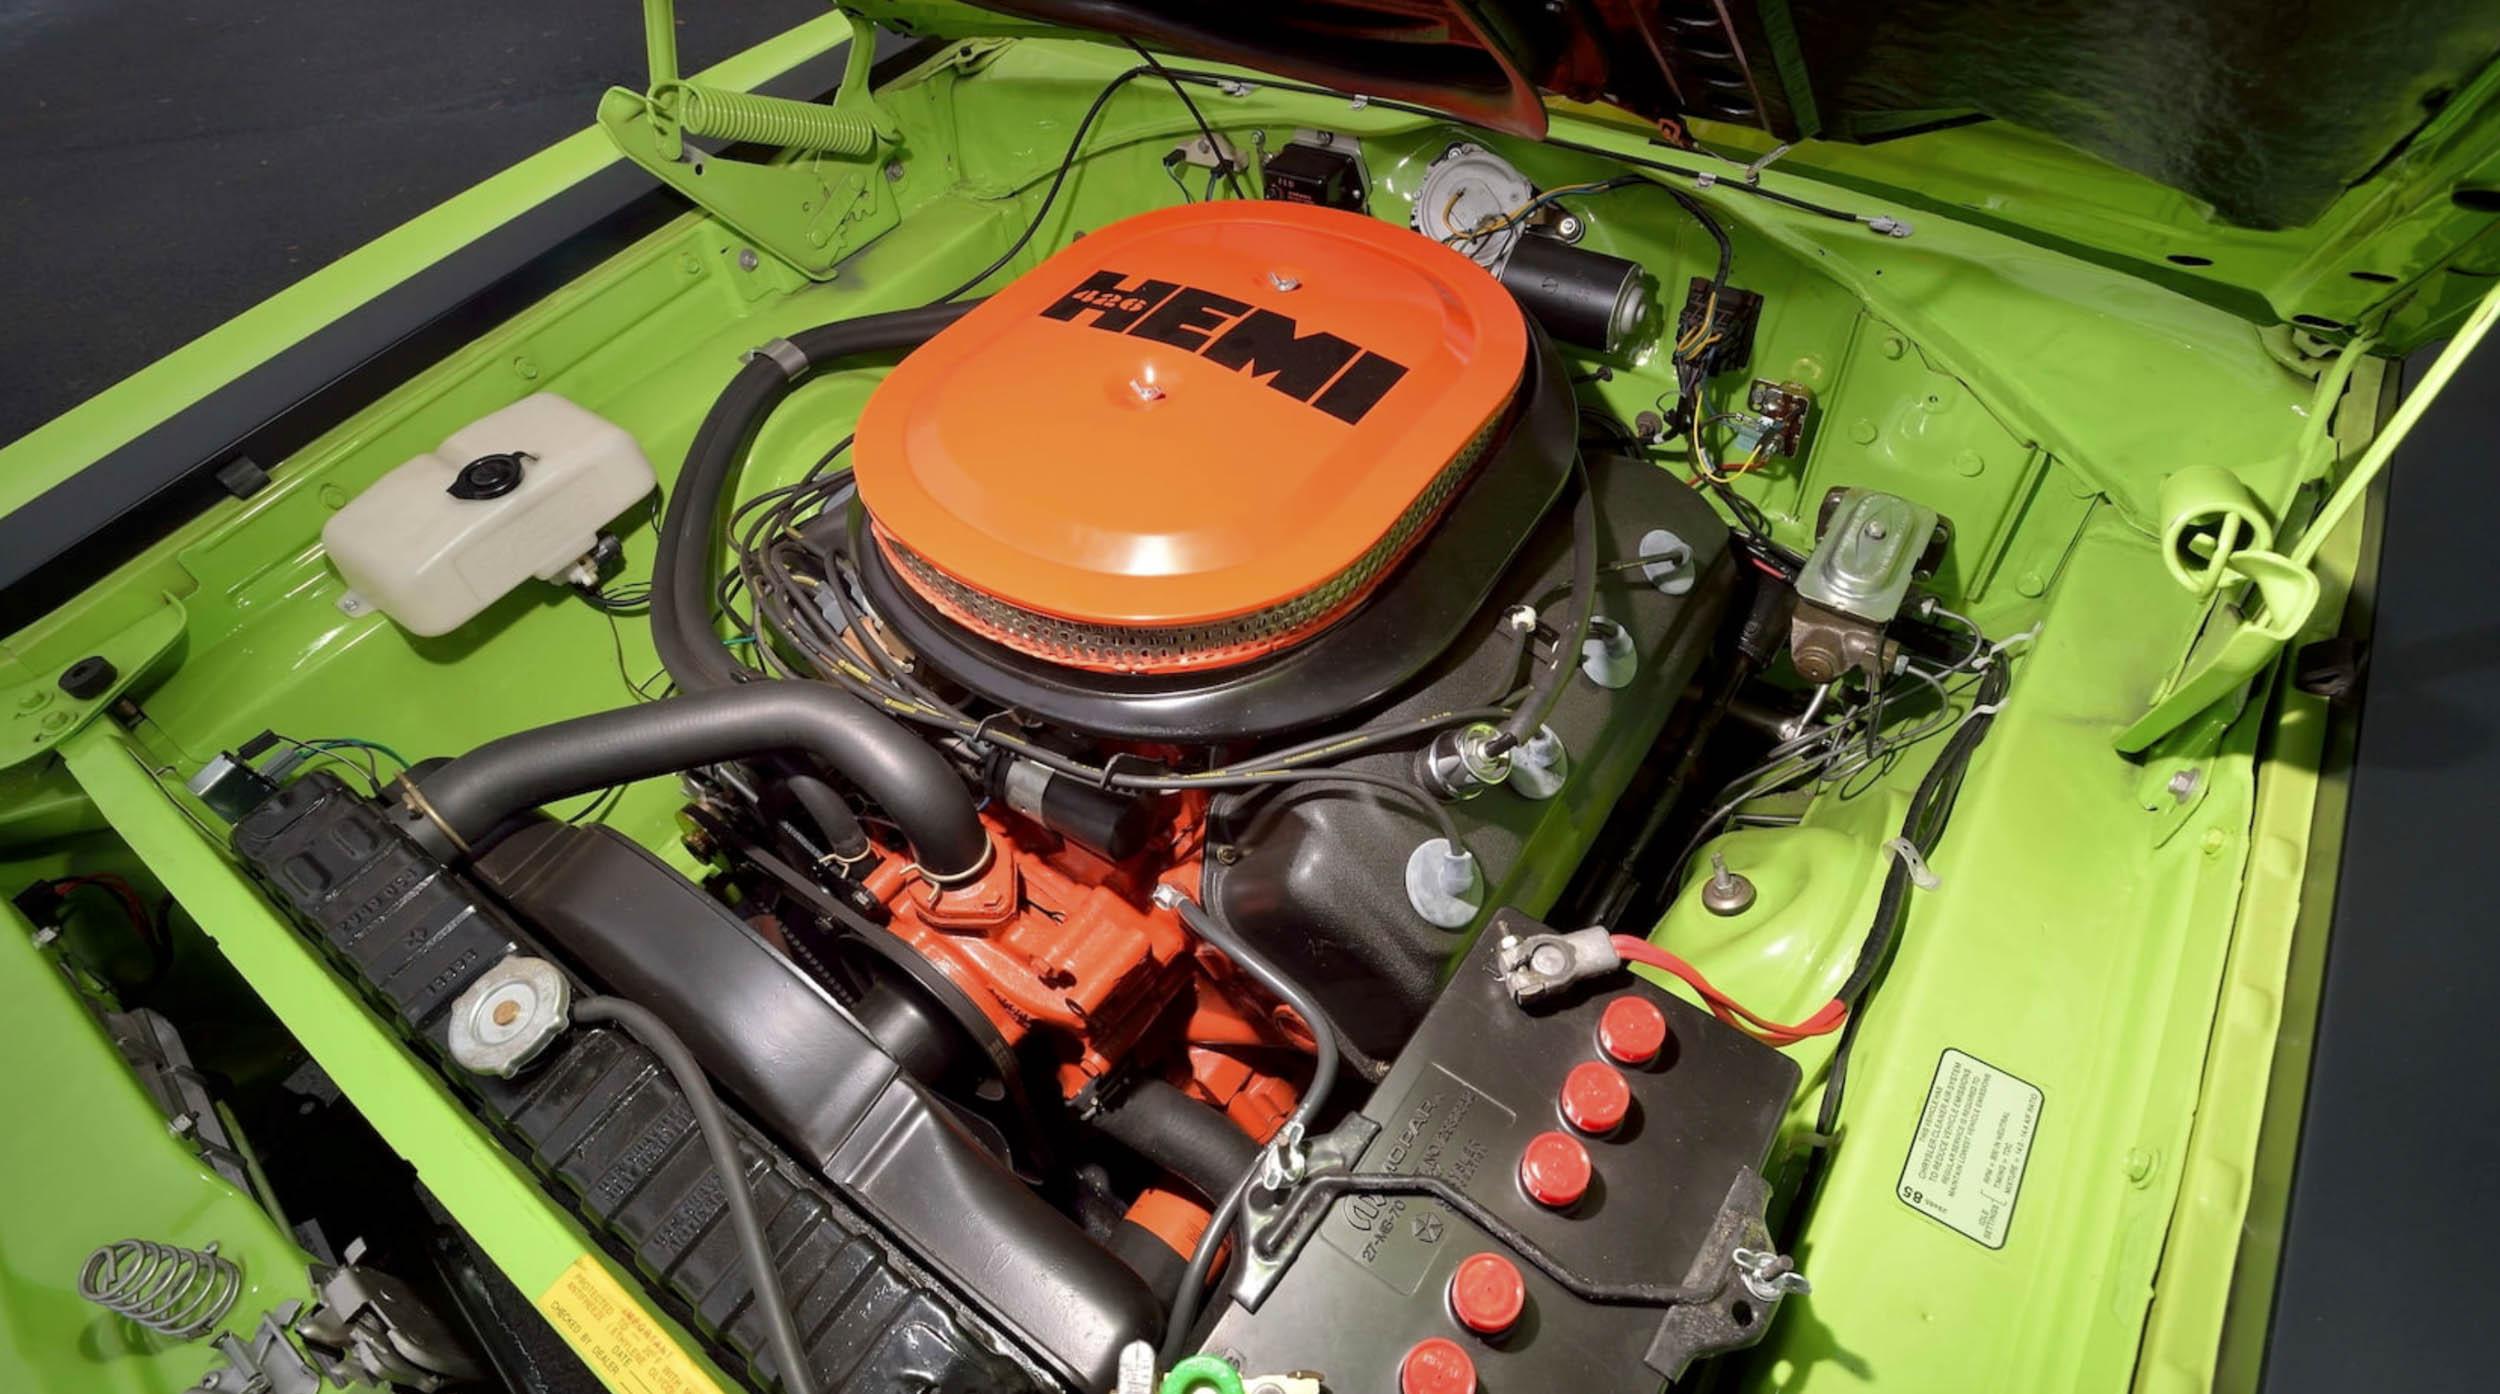 1970 Plymouth GTX 426 Hemi engine